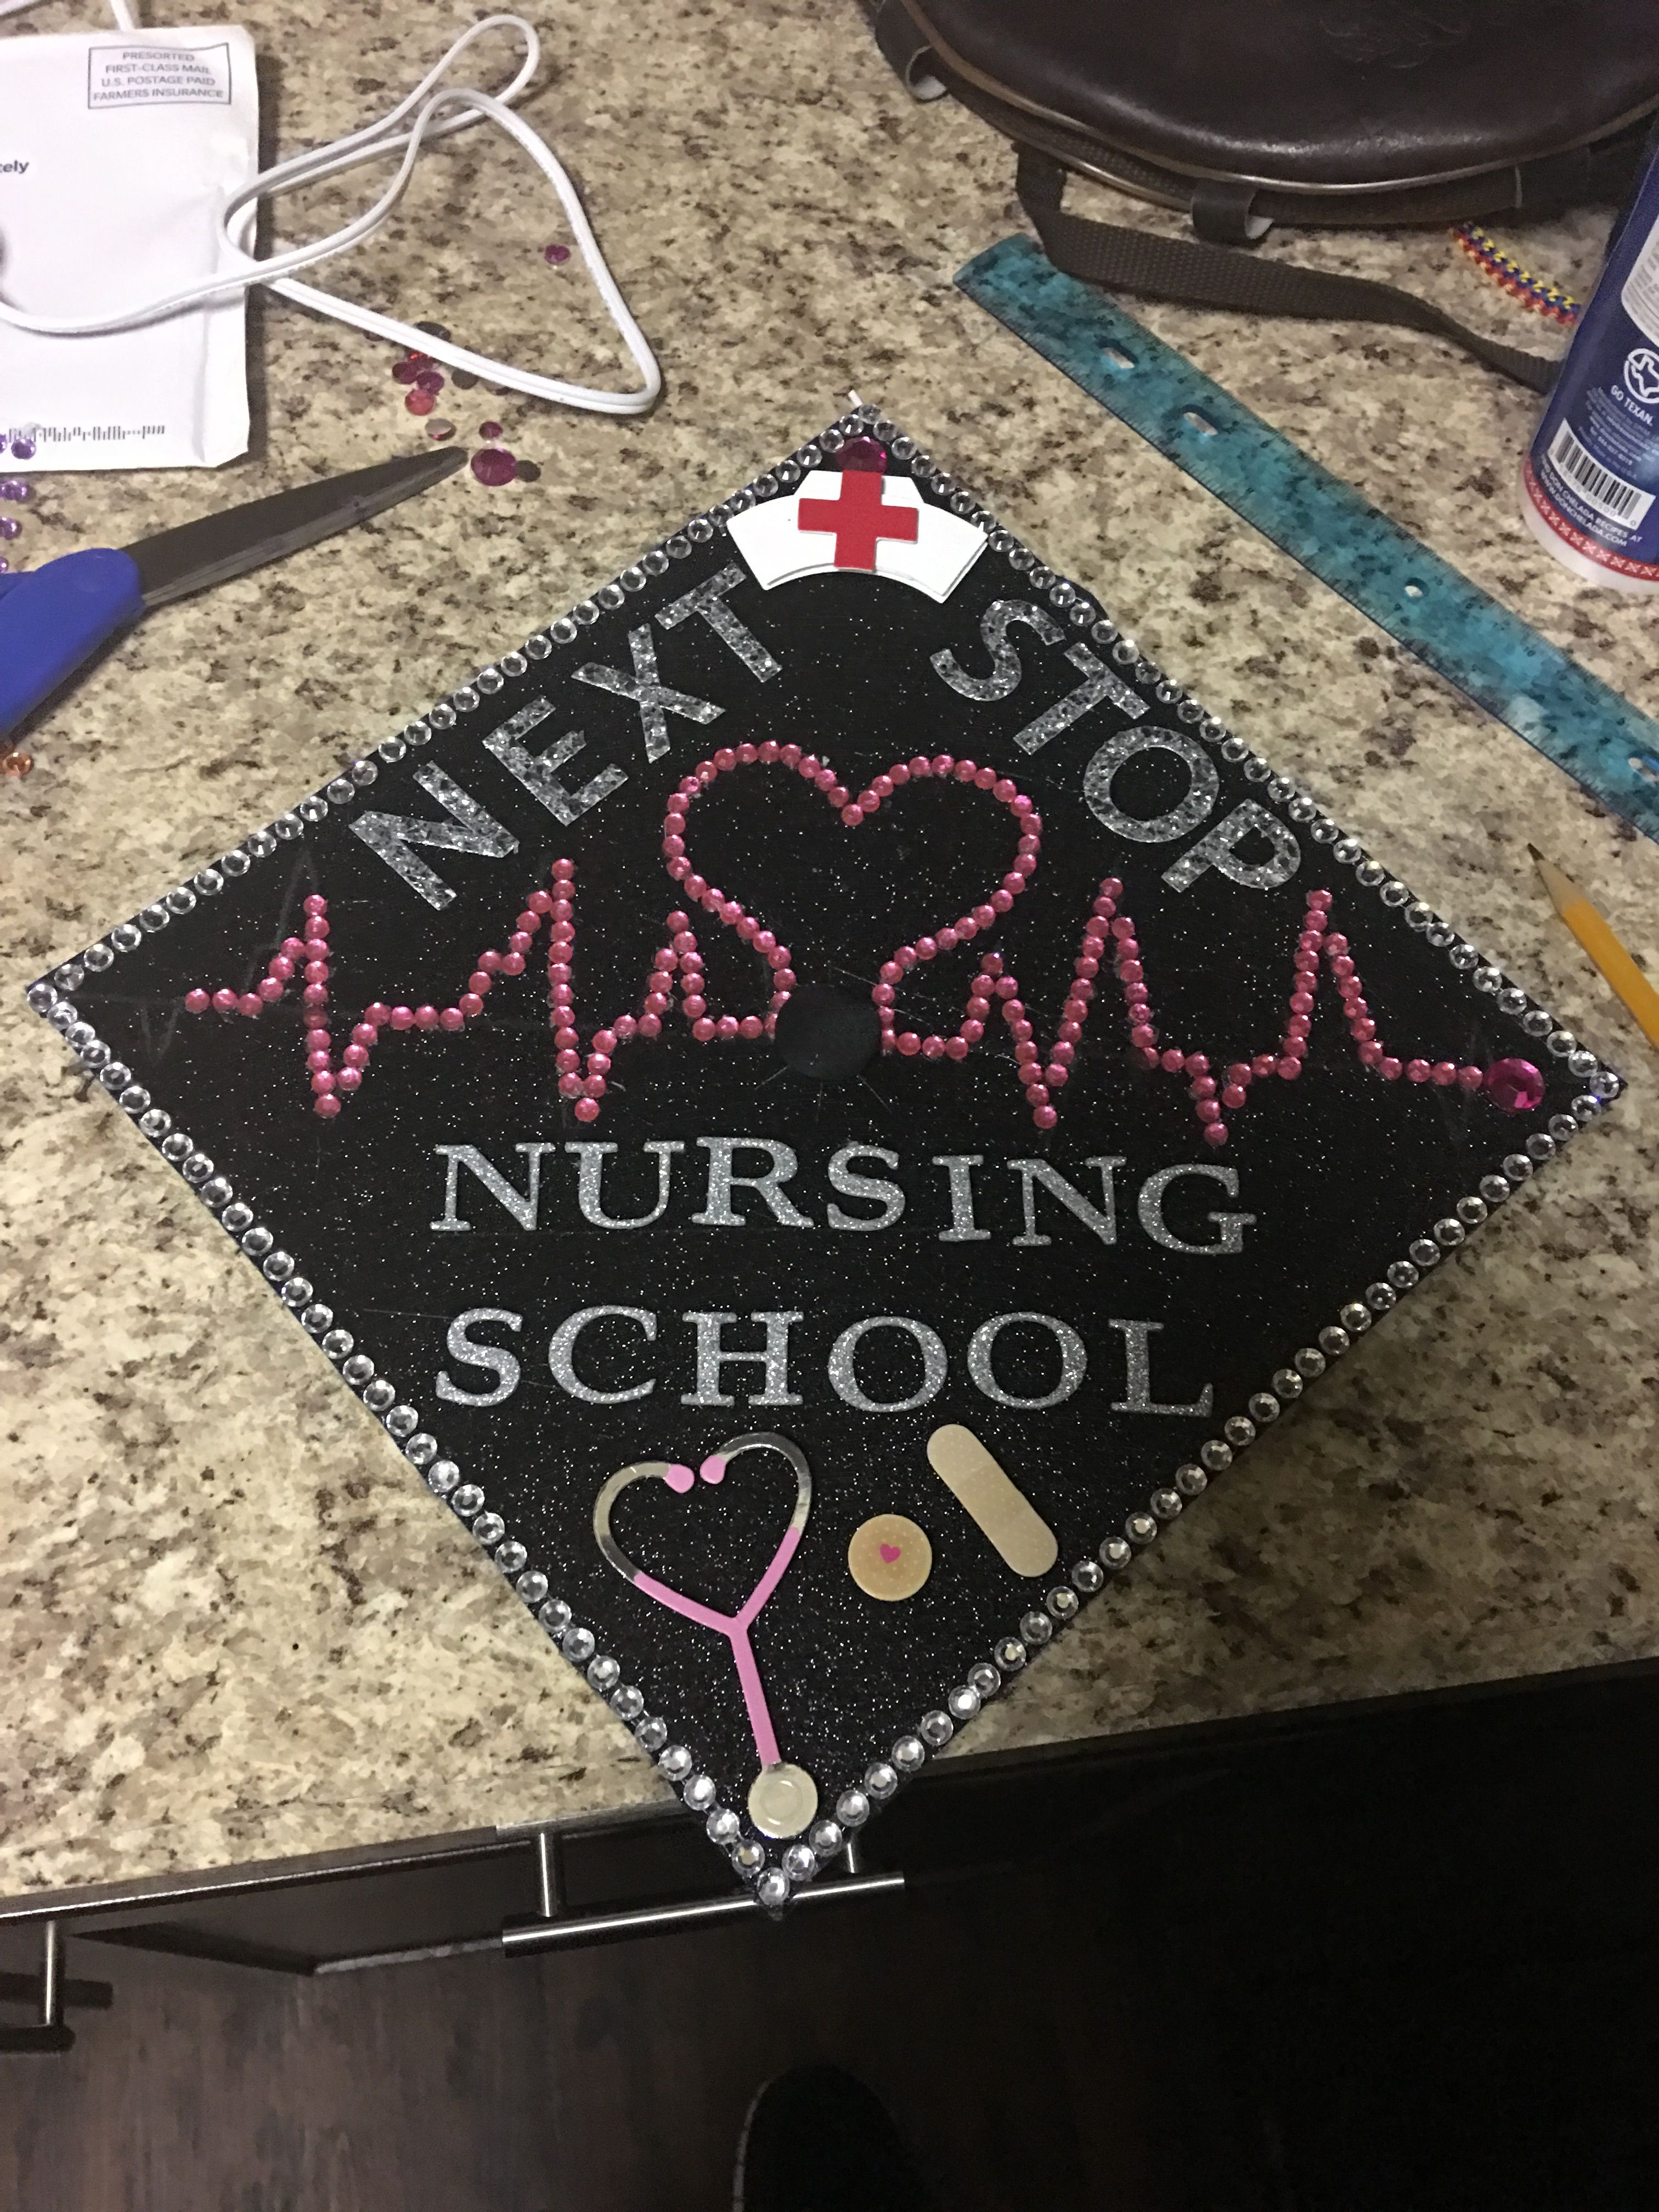 Graduation Cap Next Stop Nursing School High School Graduation Cap Decoration Rn Graduation Cap College Graduation Cap Decoration